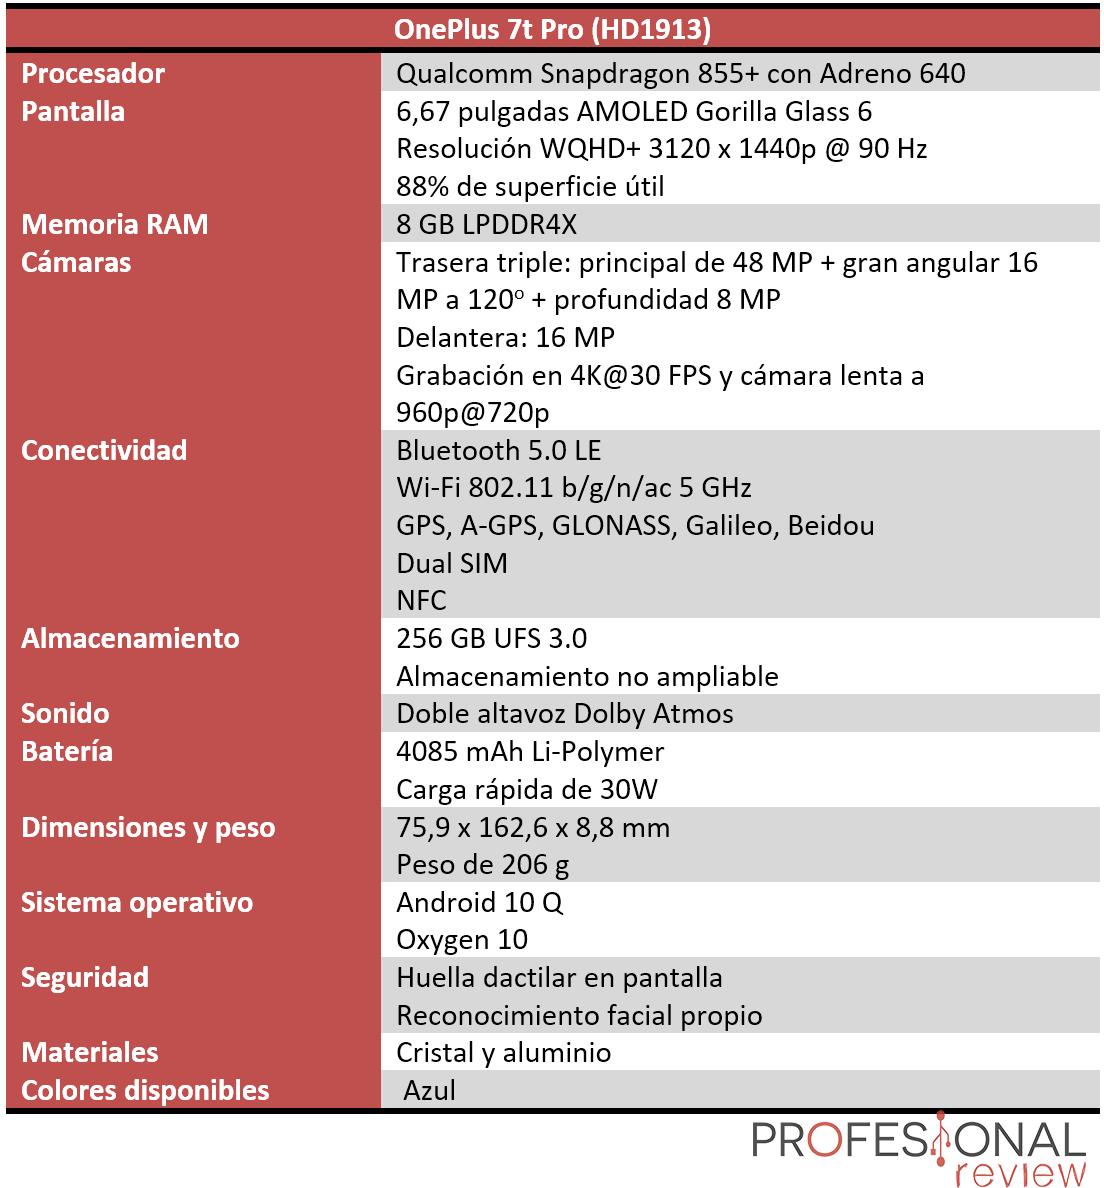 OnePlus 7t Pro Características